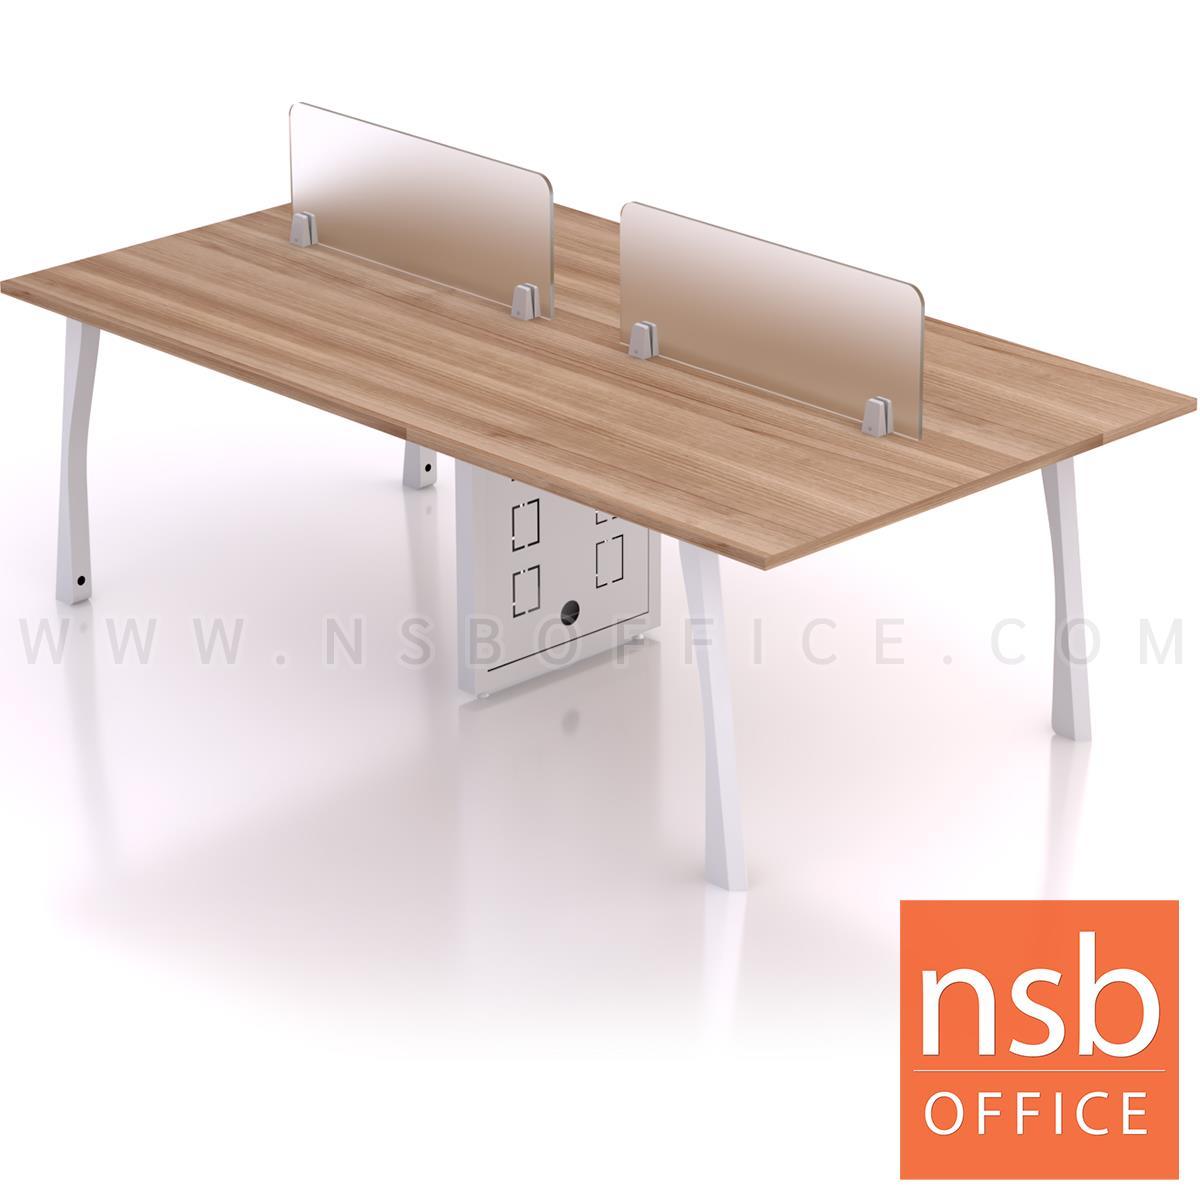 A27A053:โต๊ะทำงานกลุ่ม รุ่น Shinzo (ชินโซ) ขนาด 240W cm พร้อมมินิสกรีน ขาเหล็ก